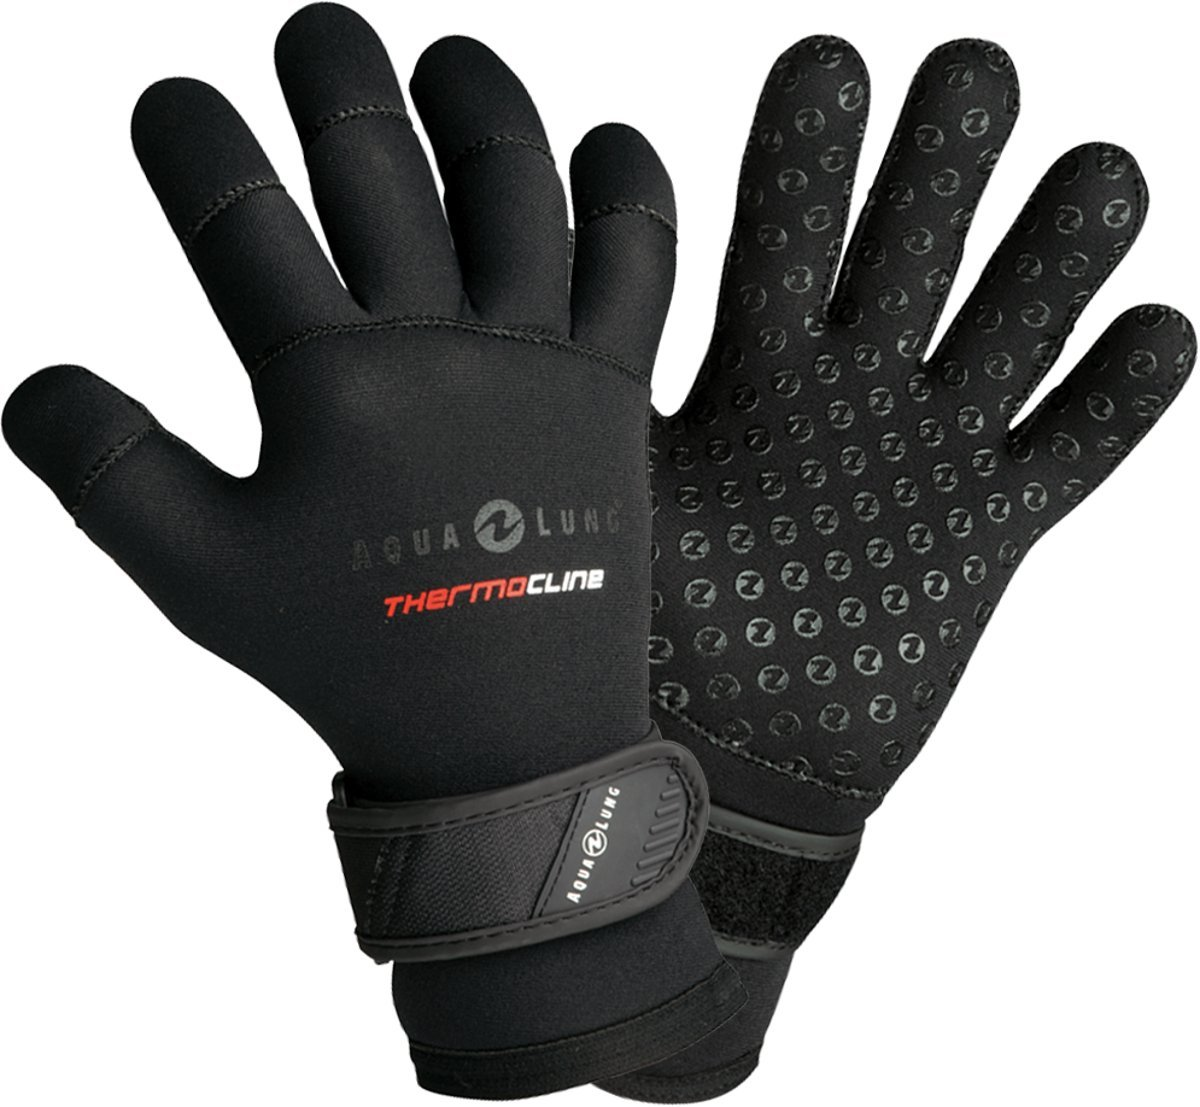 Aqua Lung 3mm Thermocline Kevlar Glove, X-Large